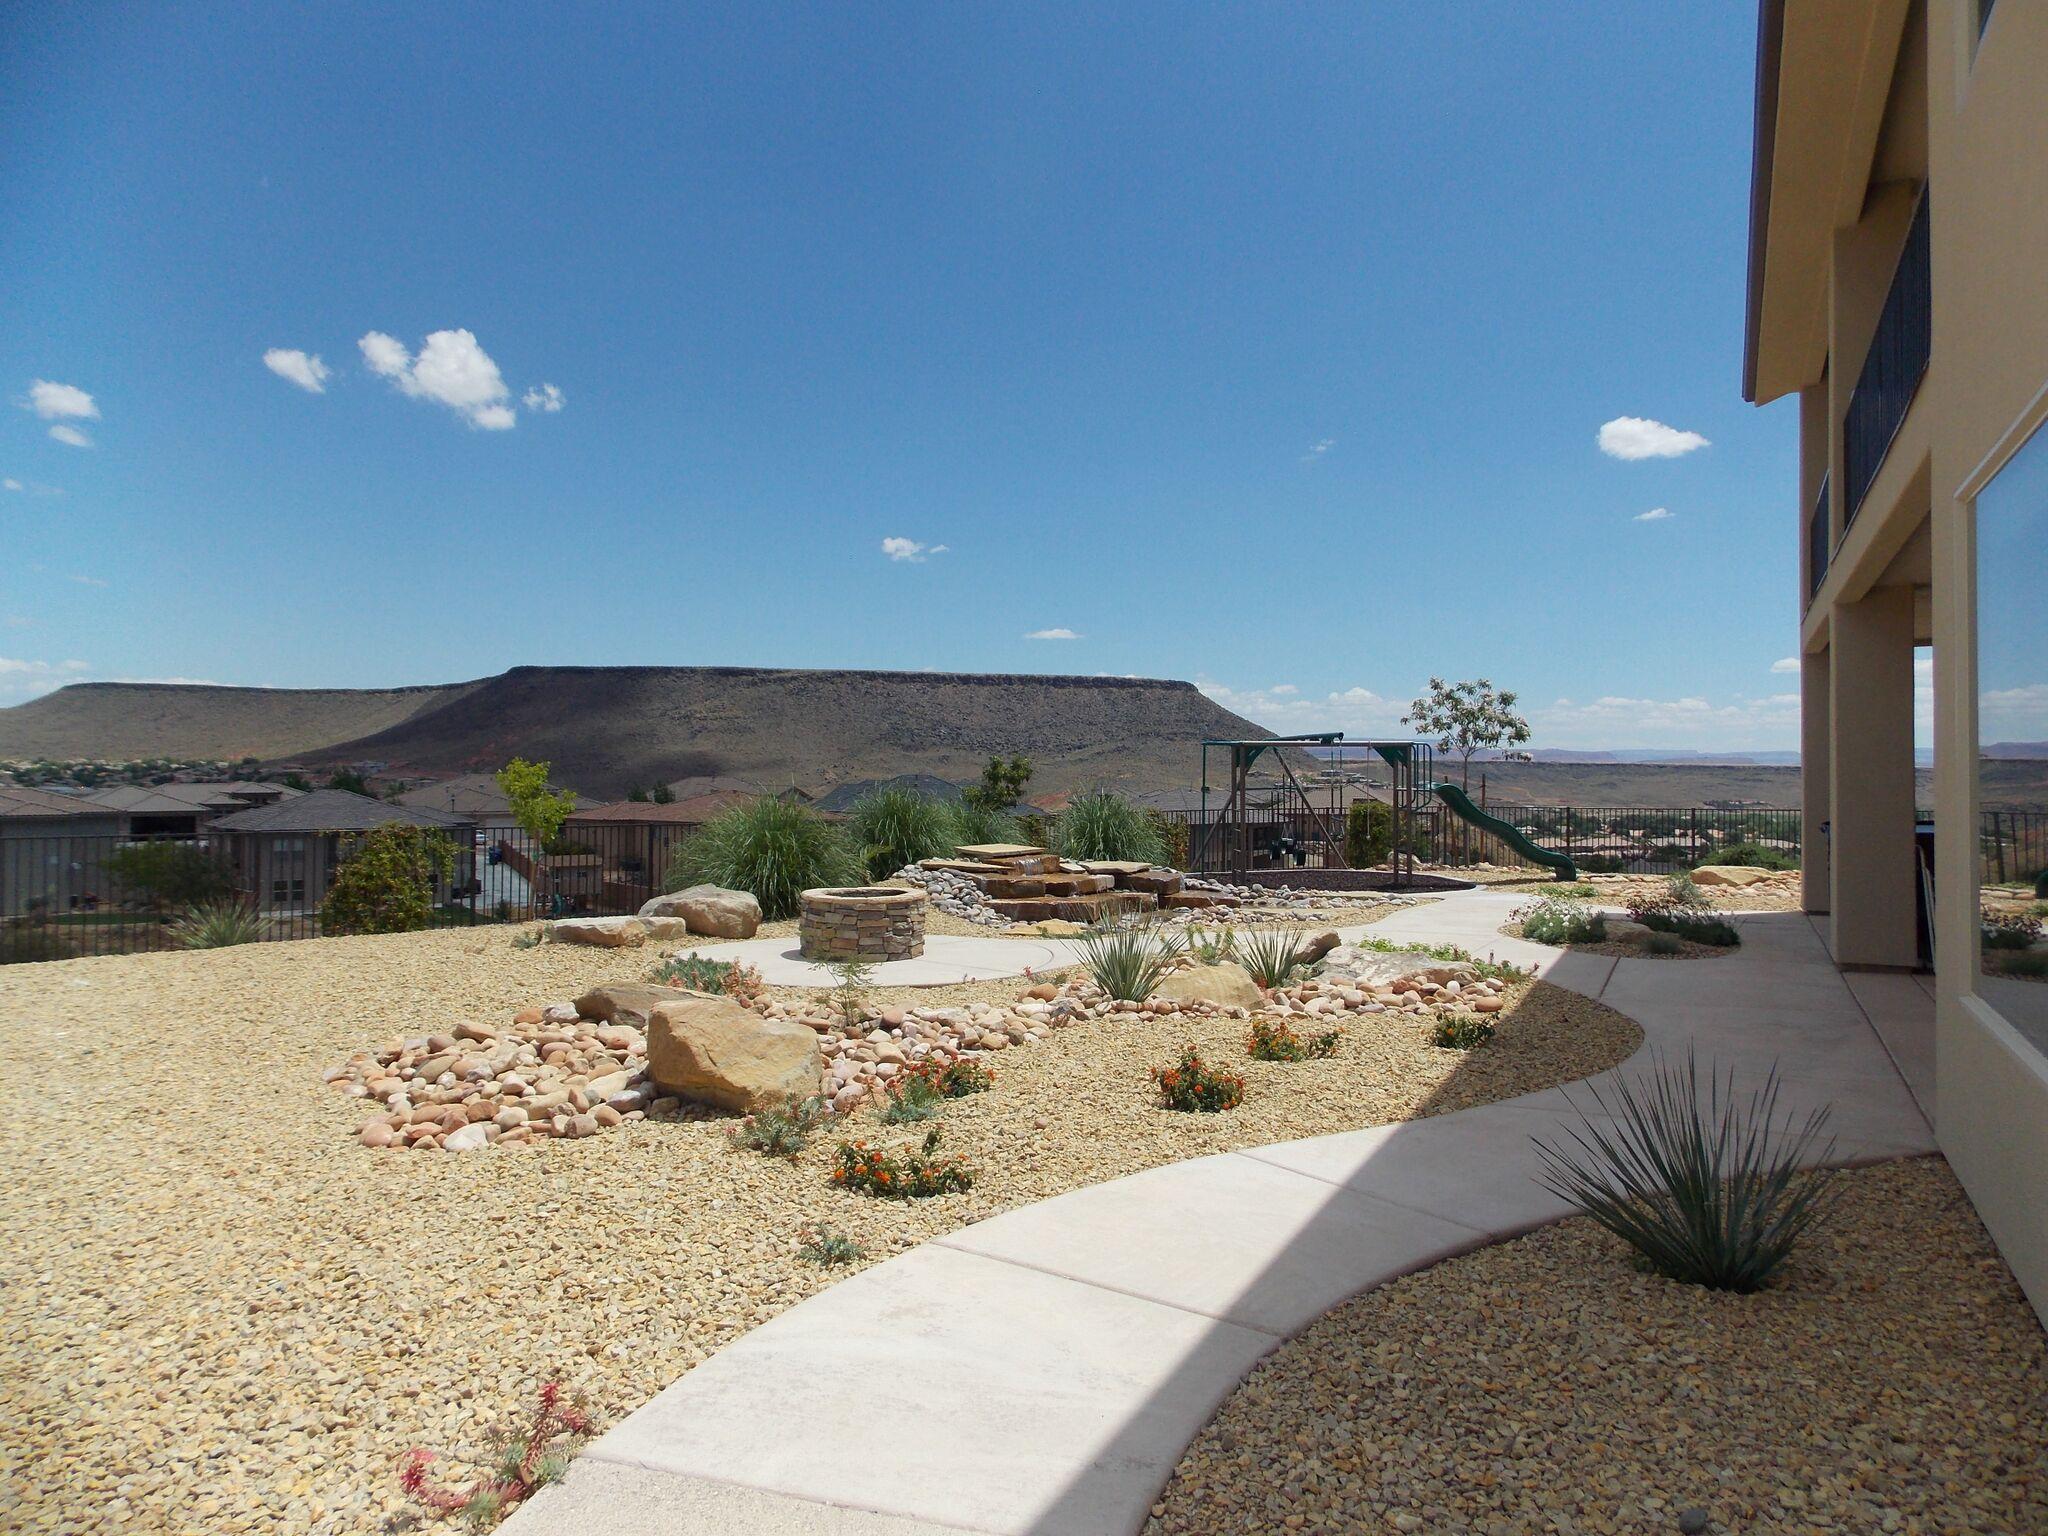 Tom Higbee Desert Pond